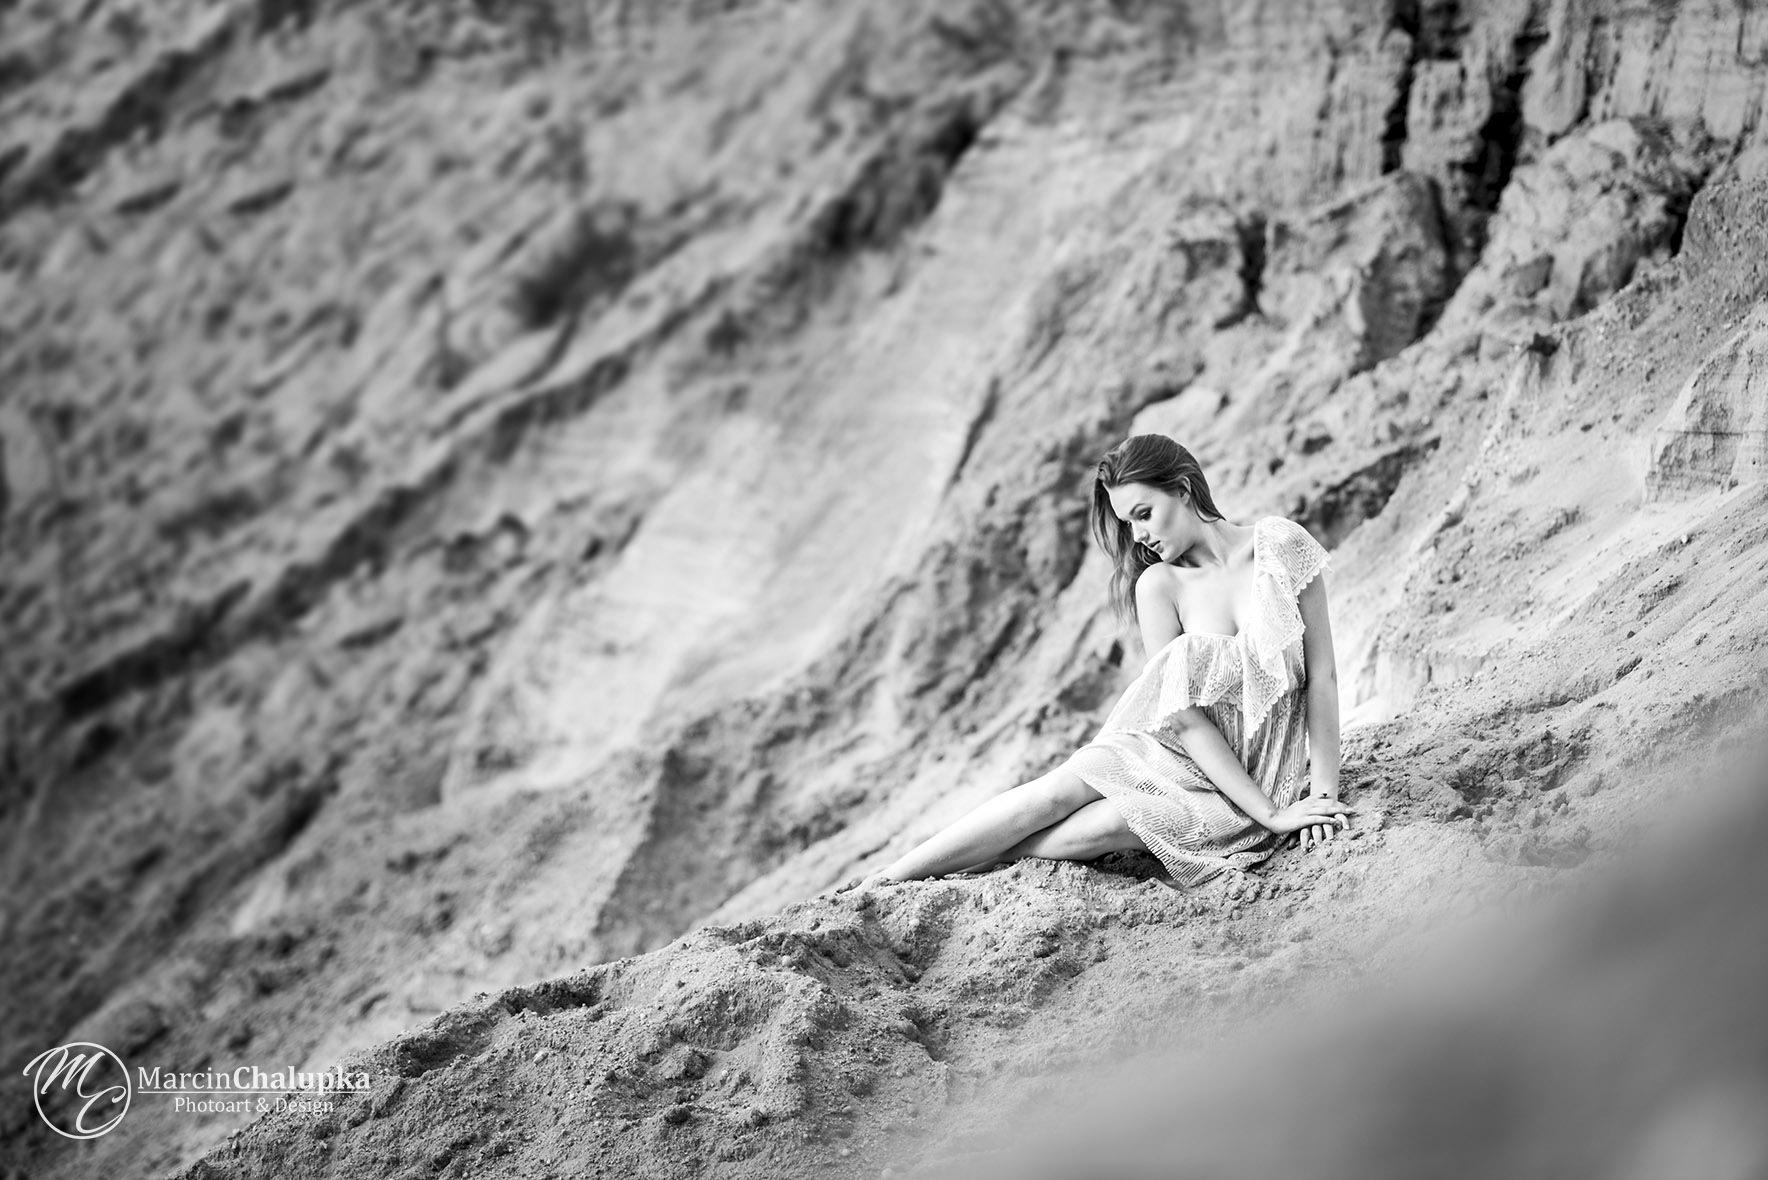 Dominiq . by MarcinChalupkaPhotography